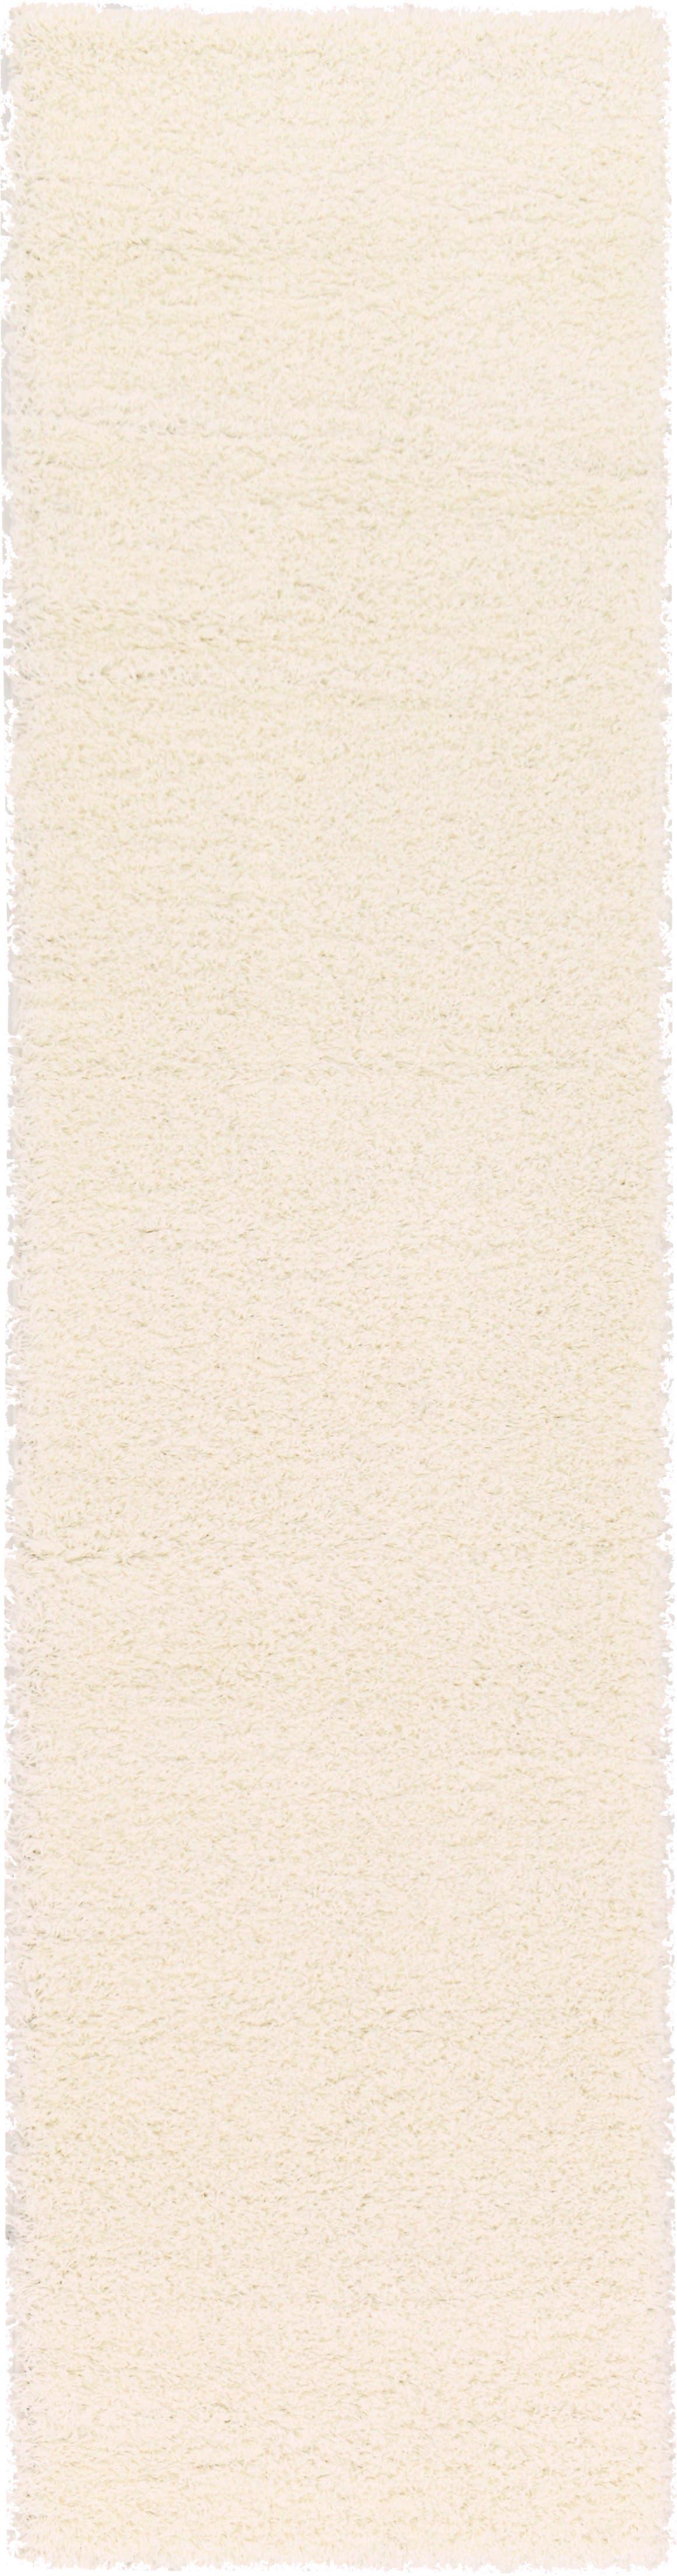 2' 6 x 10' Solid Shag Runner Rug main image